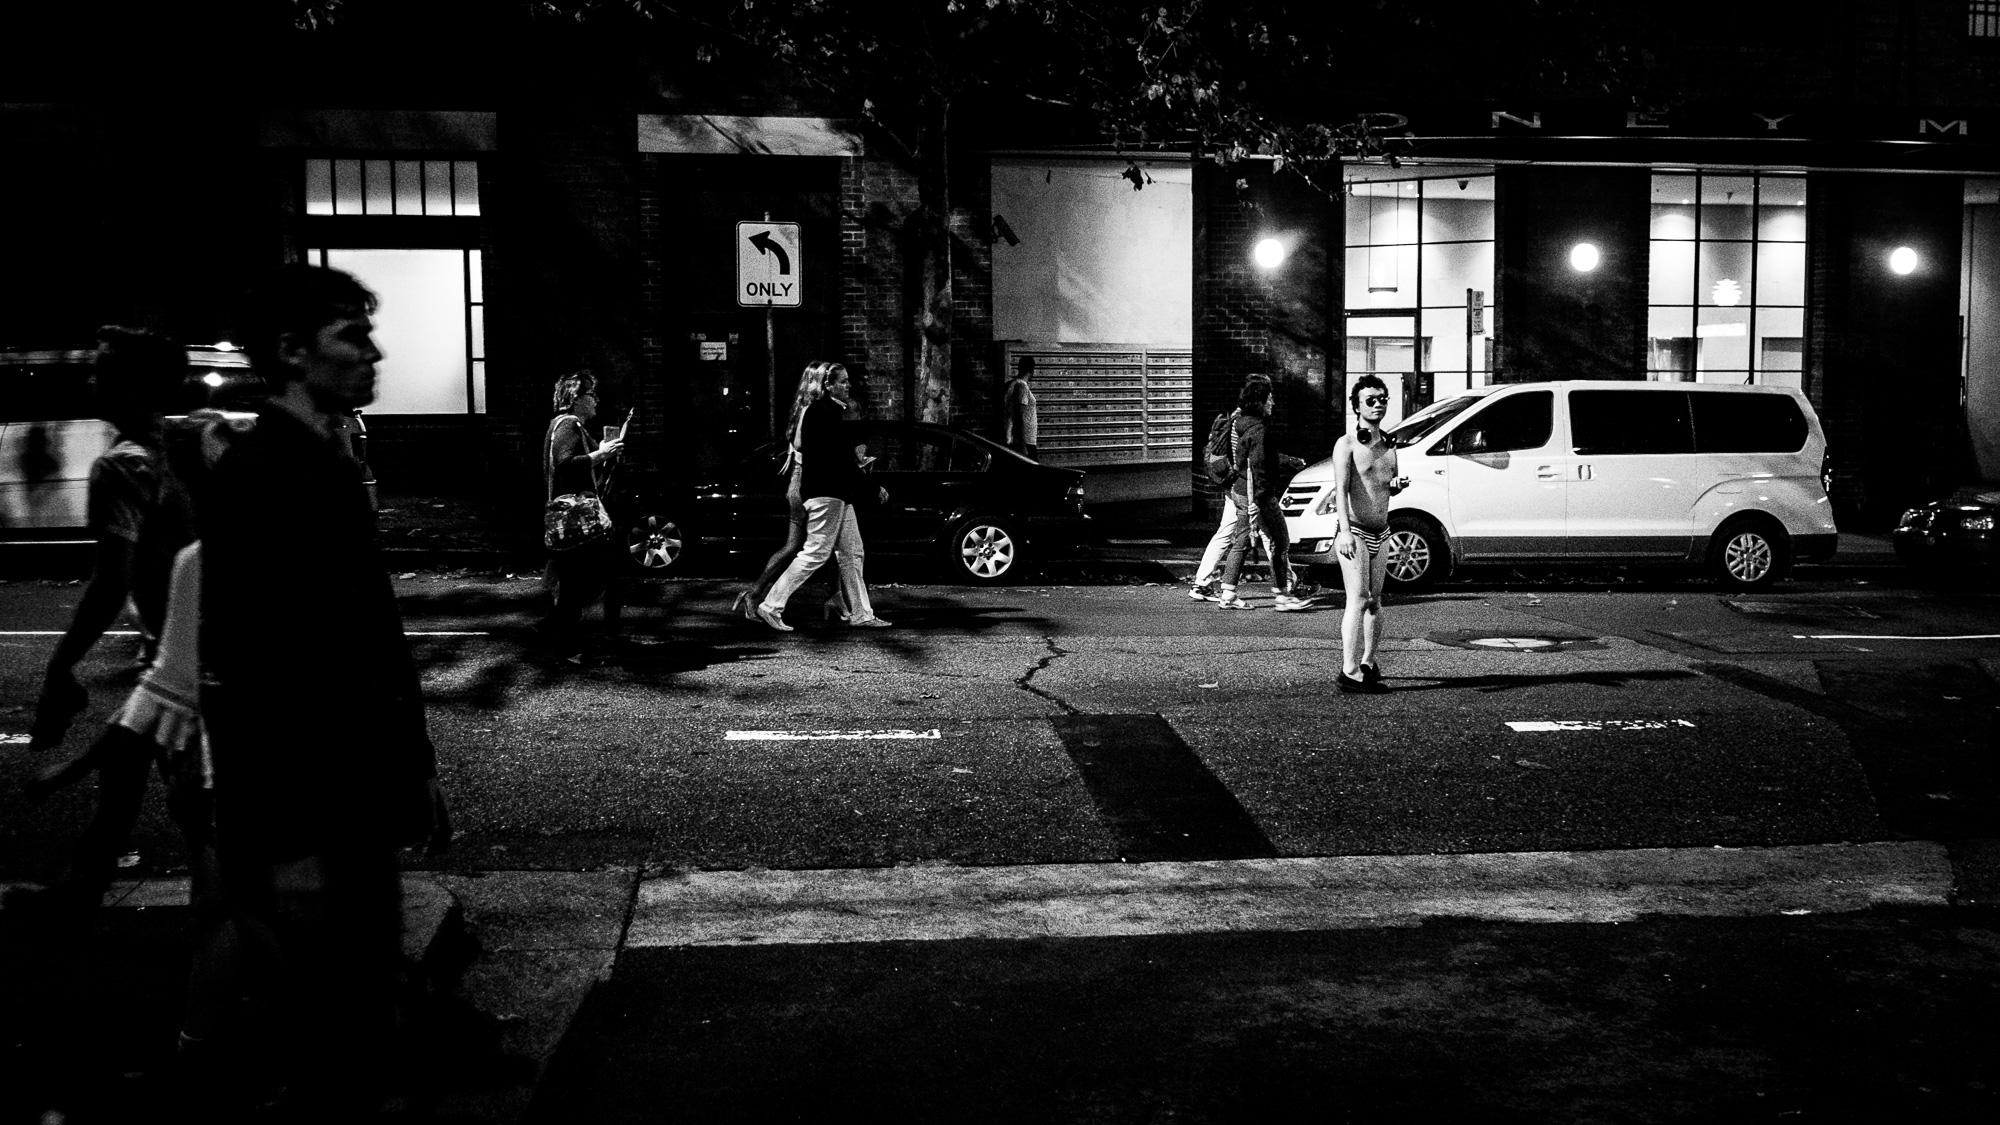 Sydney Mardi Gras 2017 - Street Photographer